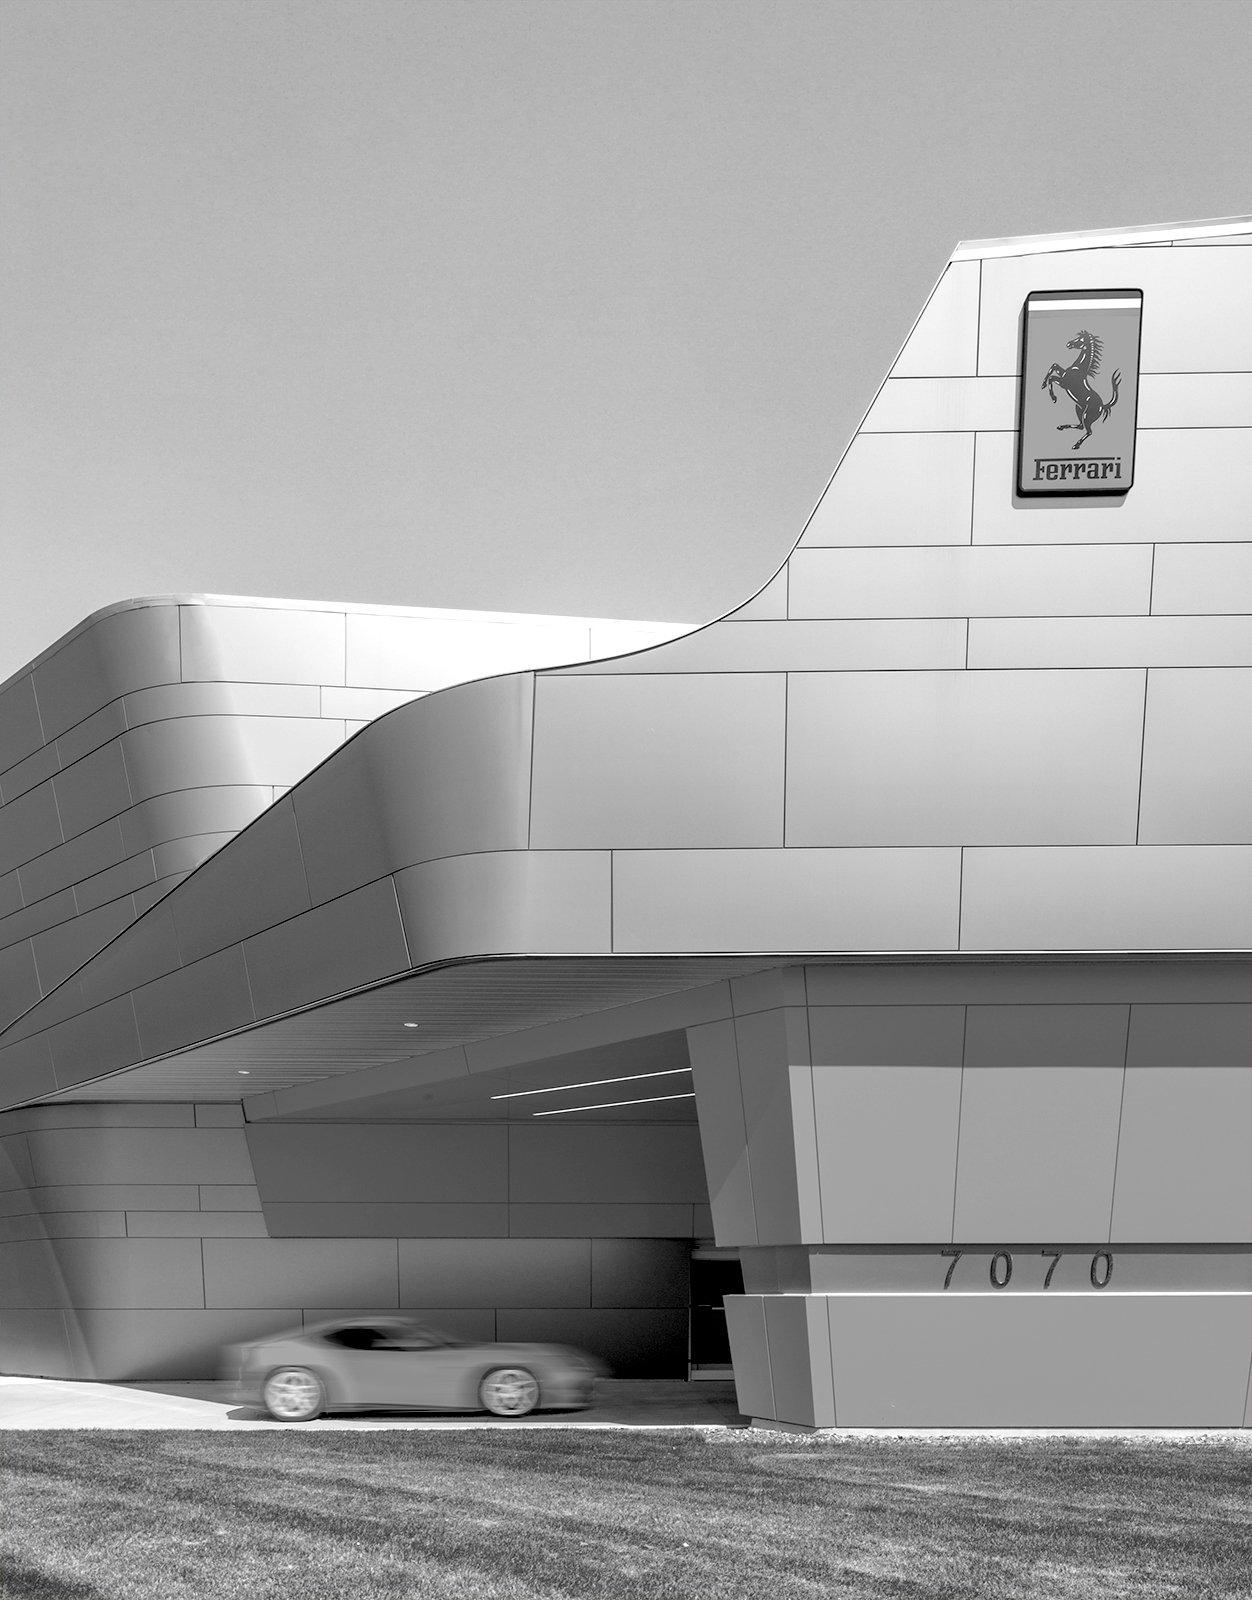 Cauley Ferrari of Detroit Project in Michigan Architecture Black and white